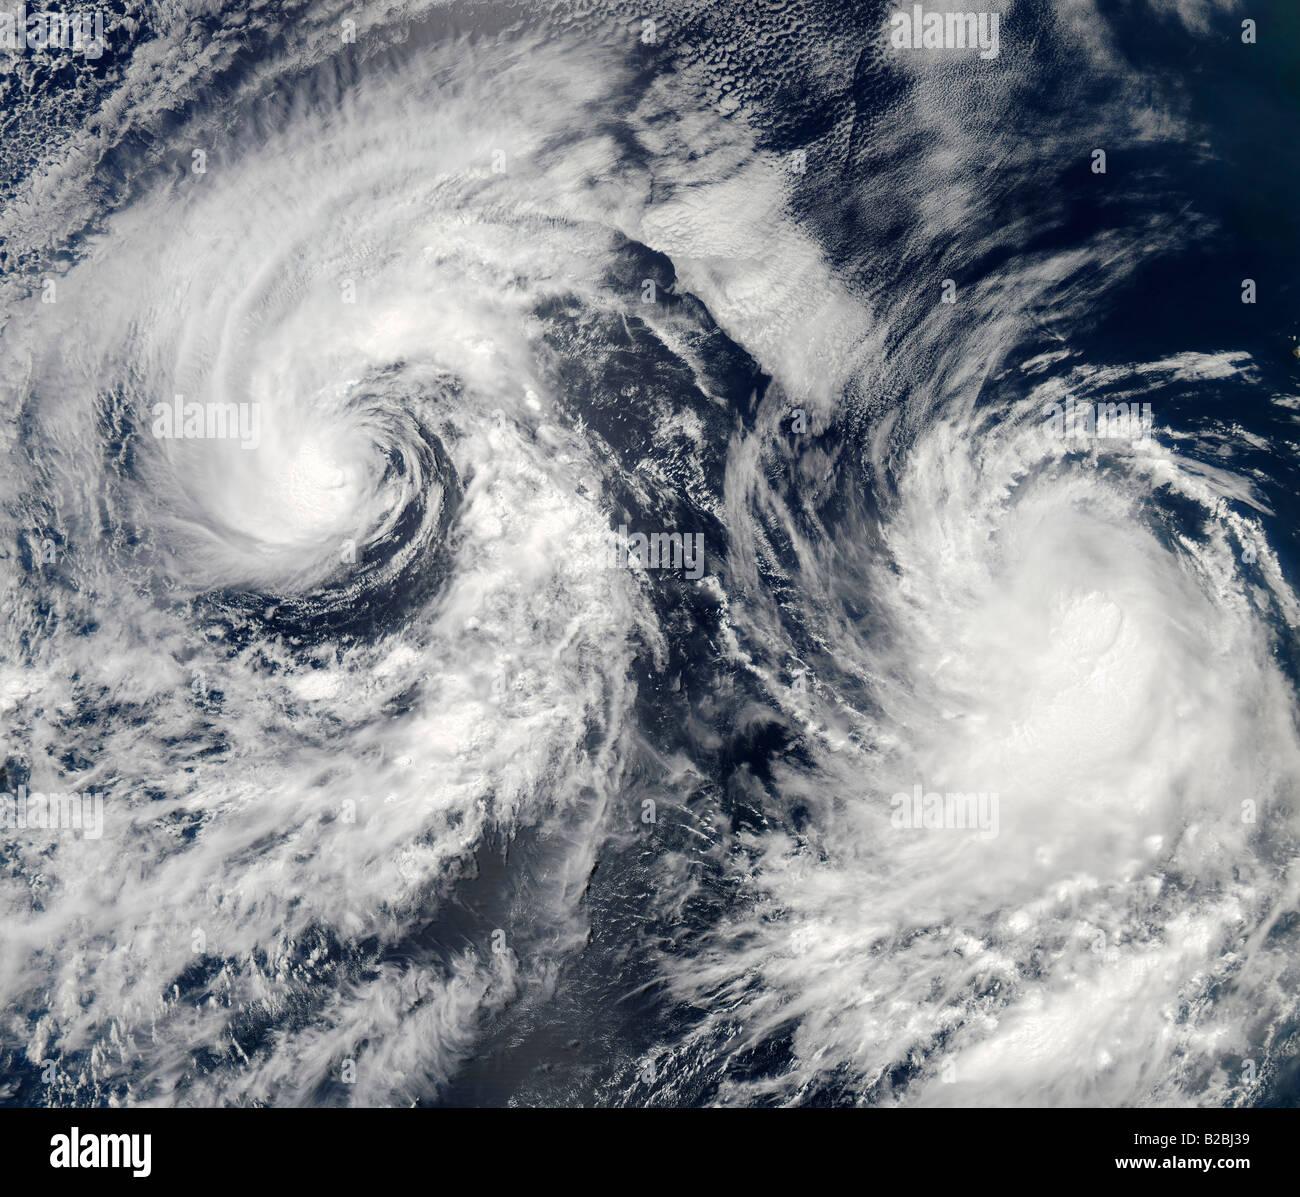 Tropical storms Boris and Cristina in the eastern Pacific Ocean.  June 28, 2008 at 21:30 UTC. - Stock Image